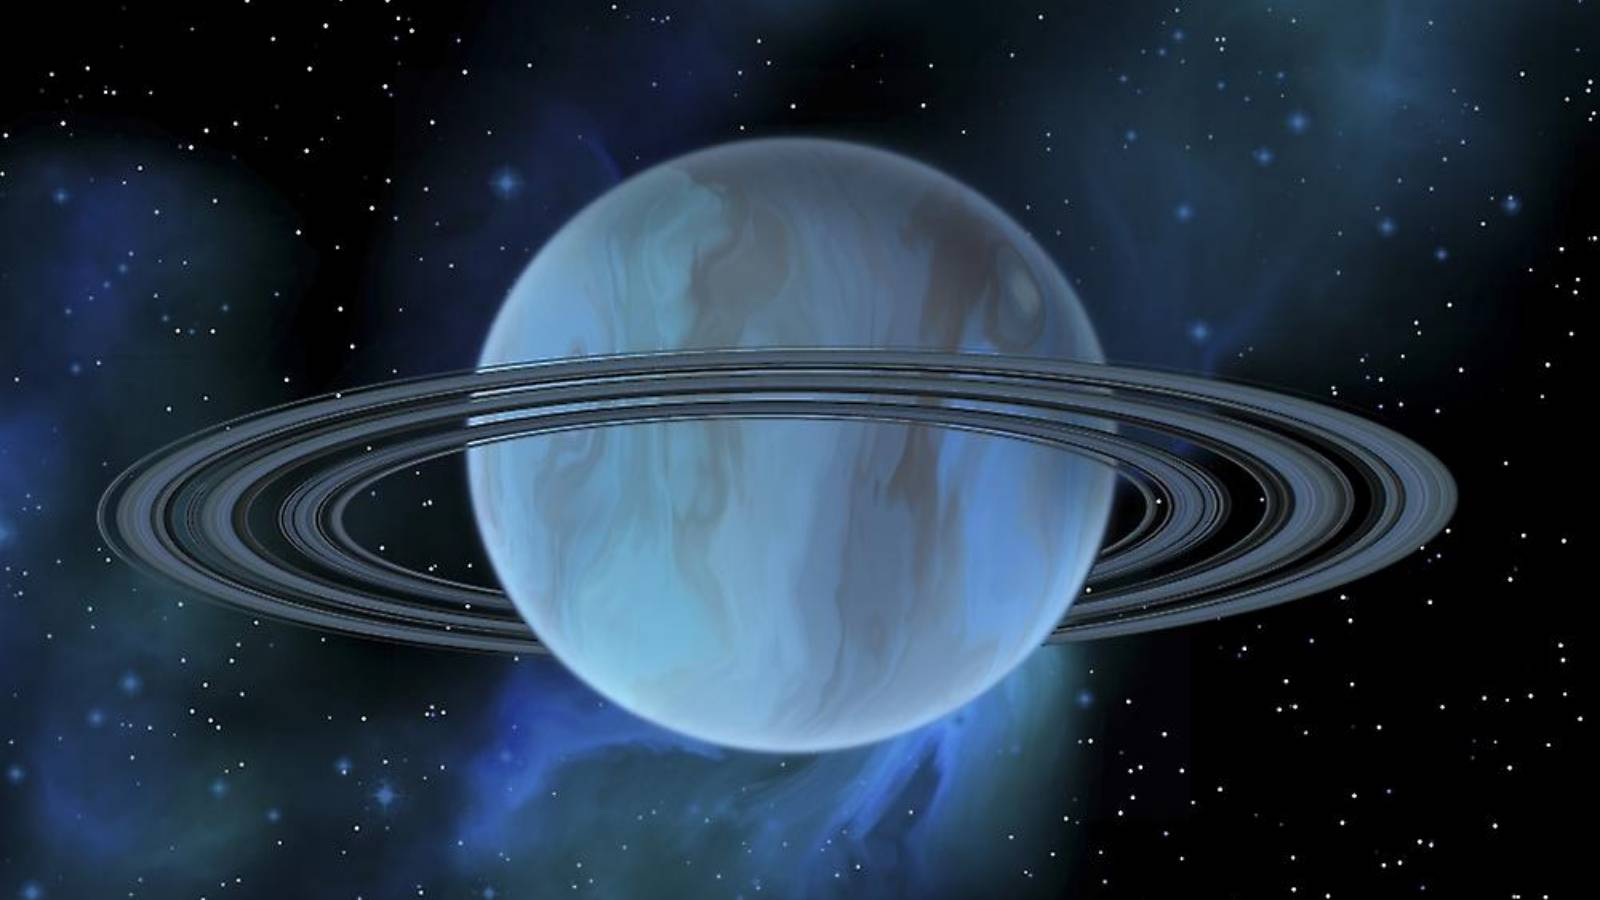 Planeta Uranus atmosfera